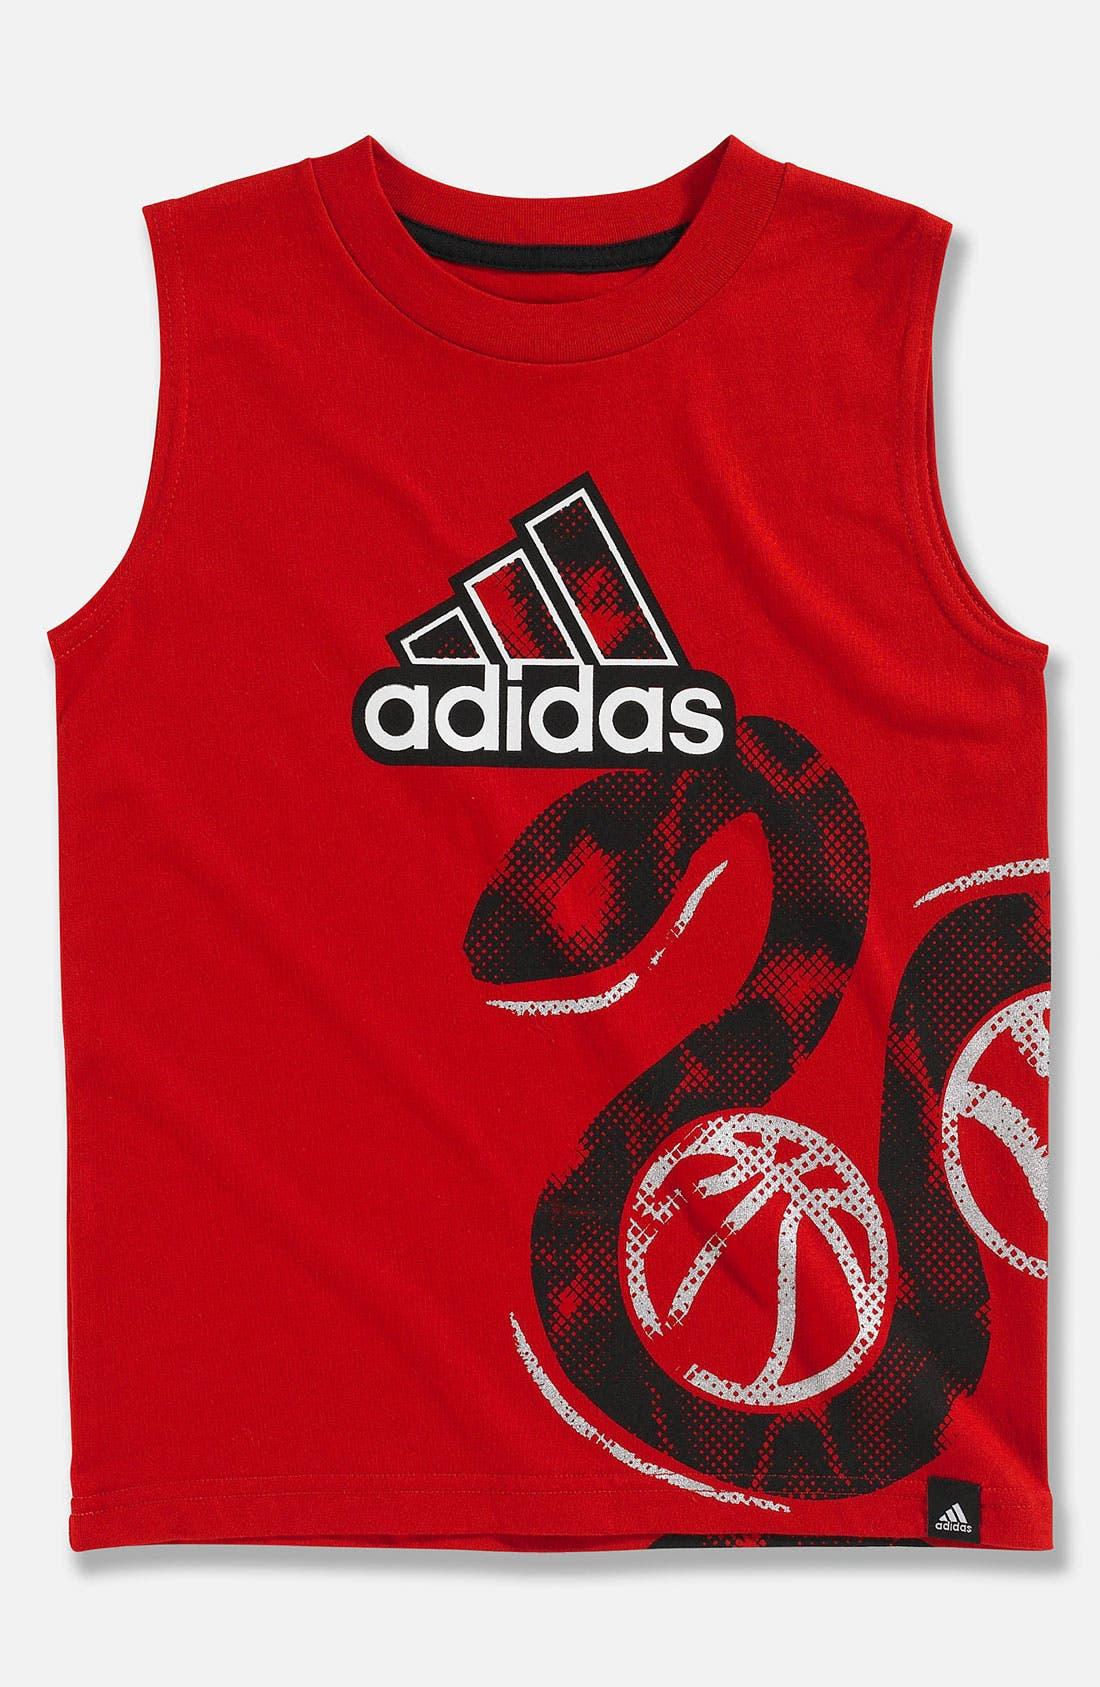 Main Image - adidas 'Big Baller' Tank Top (Little Boys)